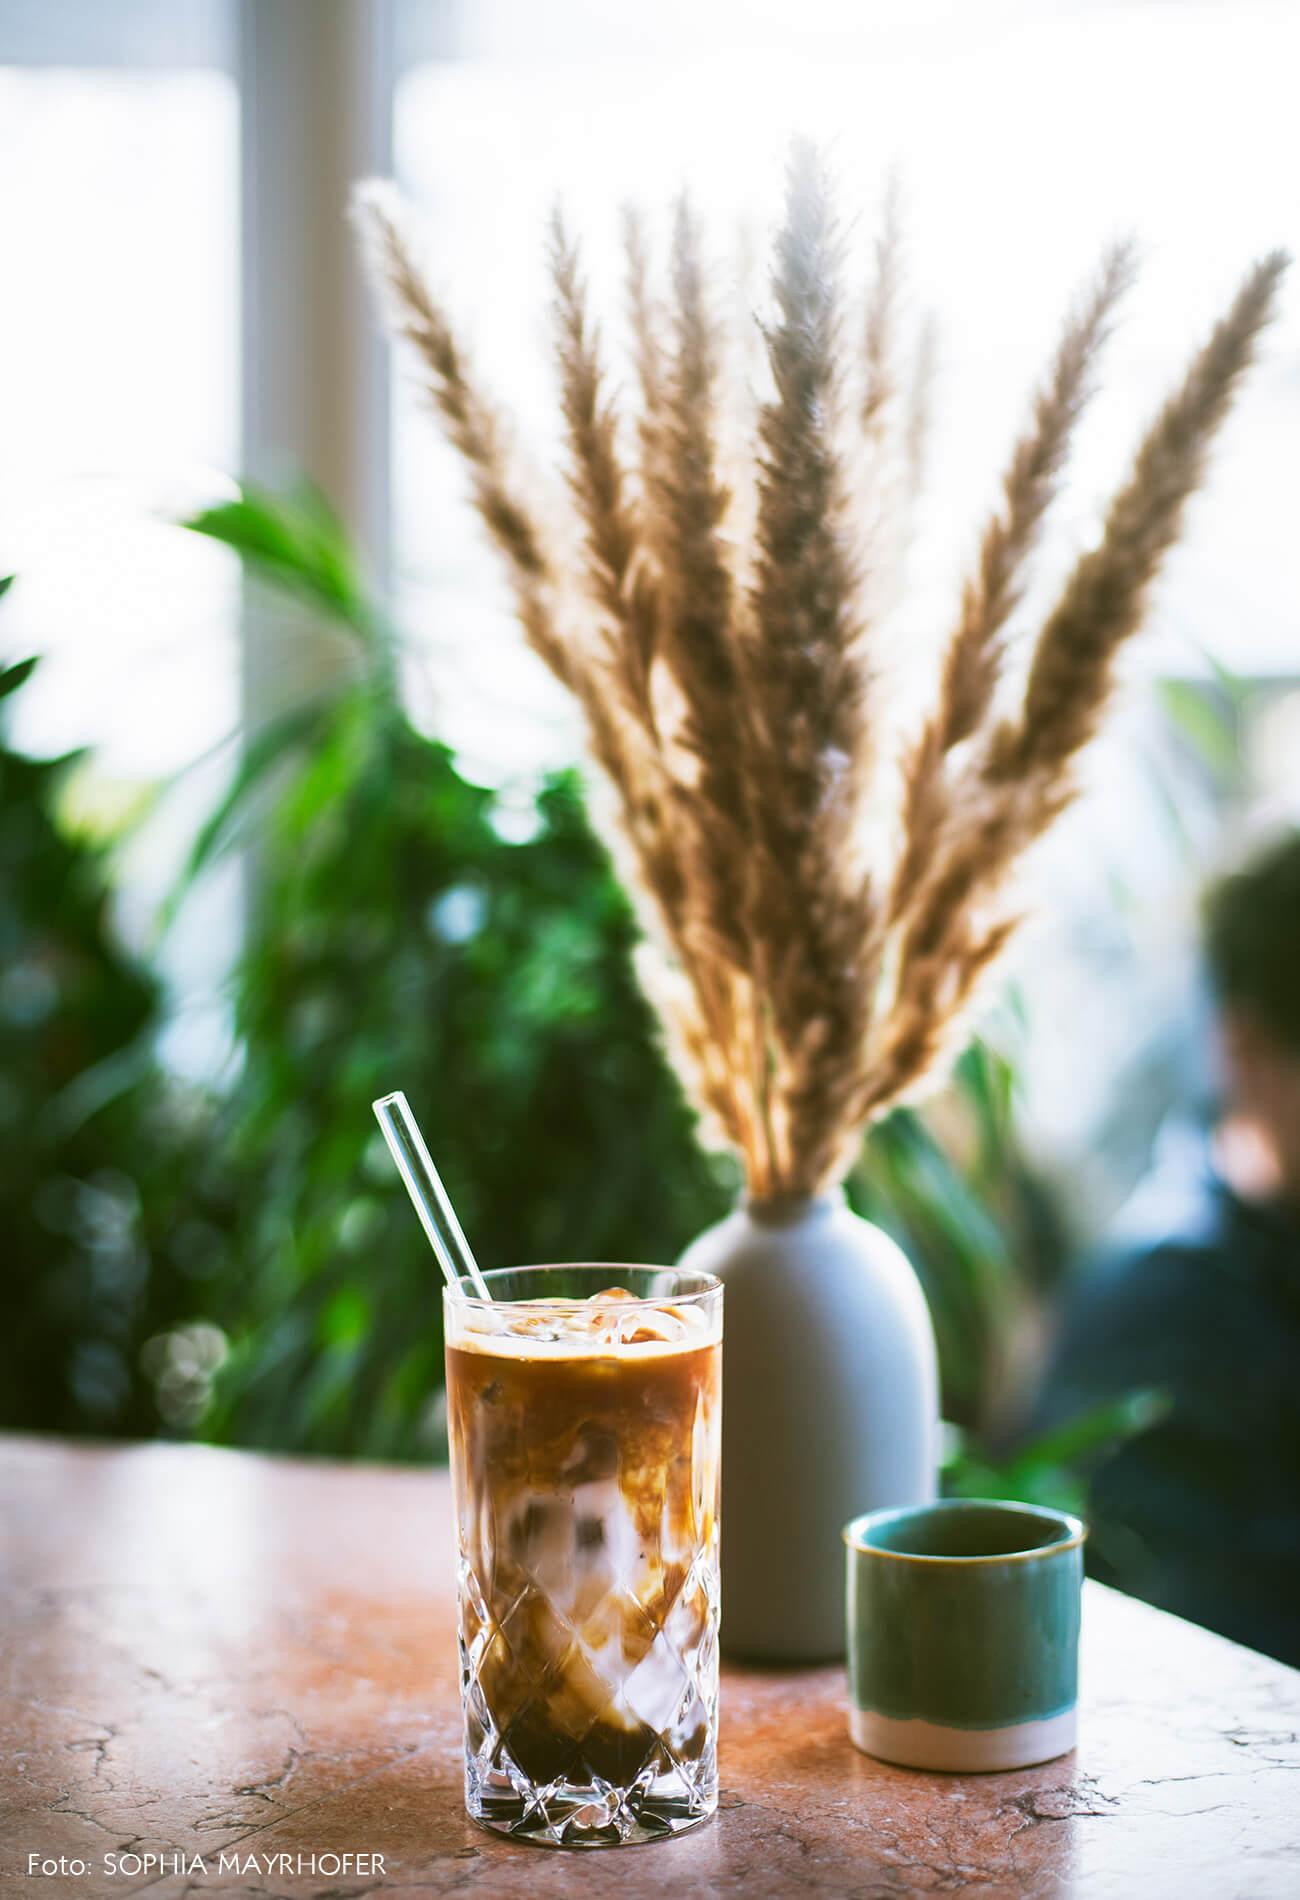 munich-detalhe-bebida